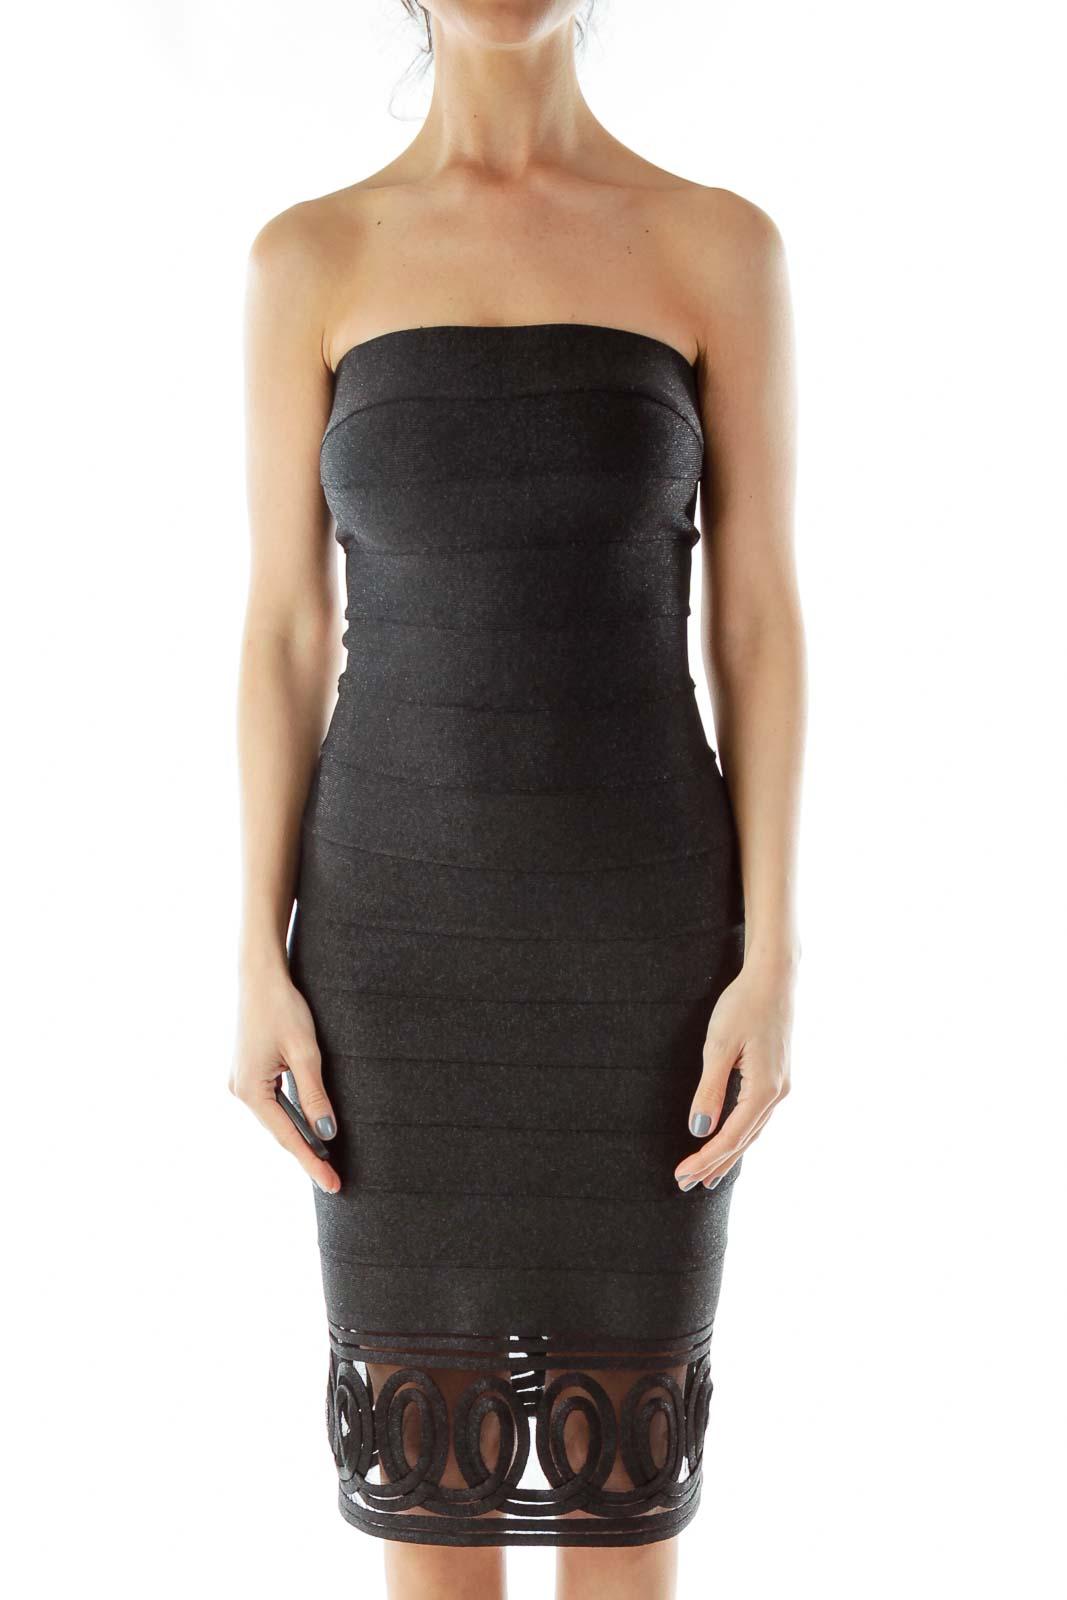 Black Metallic Bodycon Dress Front